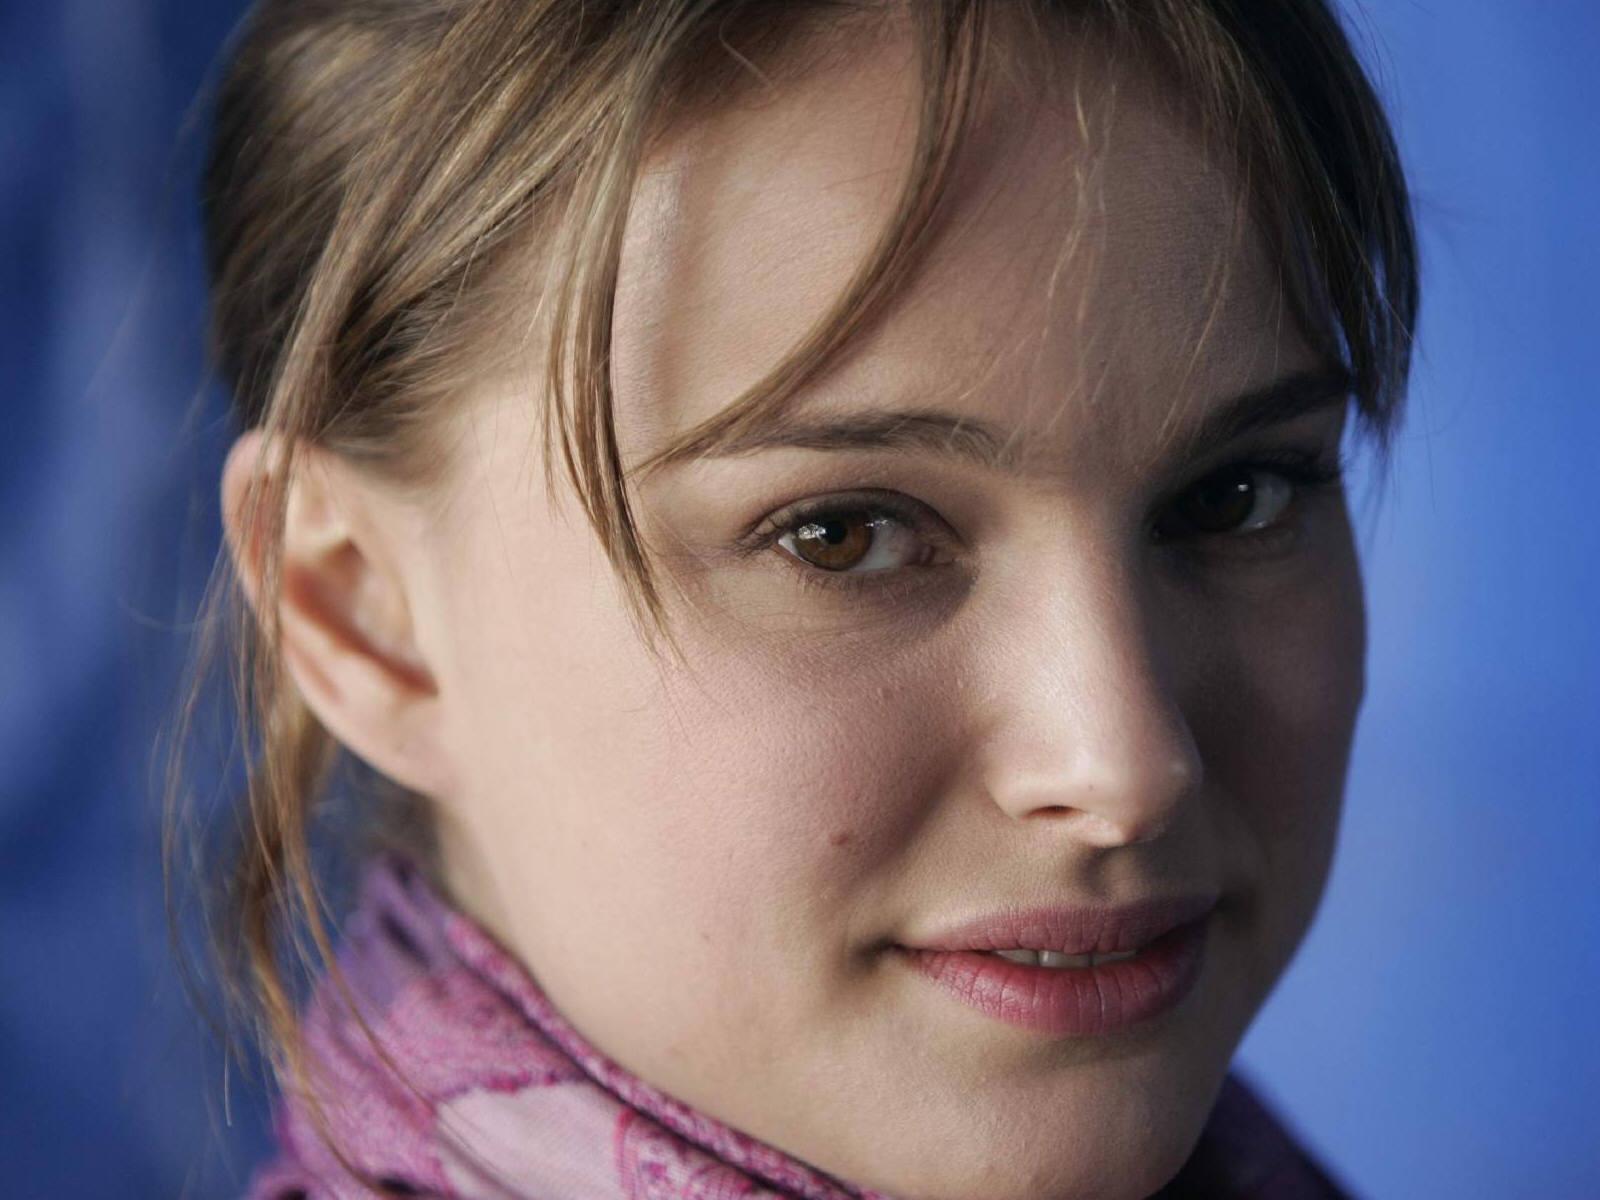 http://4.bp.blogspot.com/-2OQbWAAENZU/TsU98SWLuRI/AAAAAAAAJQg/9Rp29VVr_2Q/s1600/Natalie_Portman_DESKTOP_cute_WALLPAPER_smile.jpg